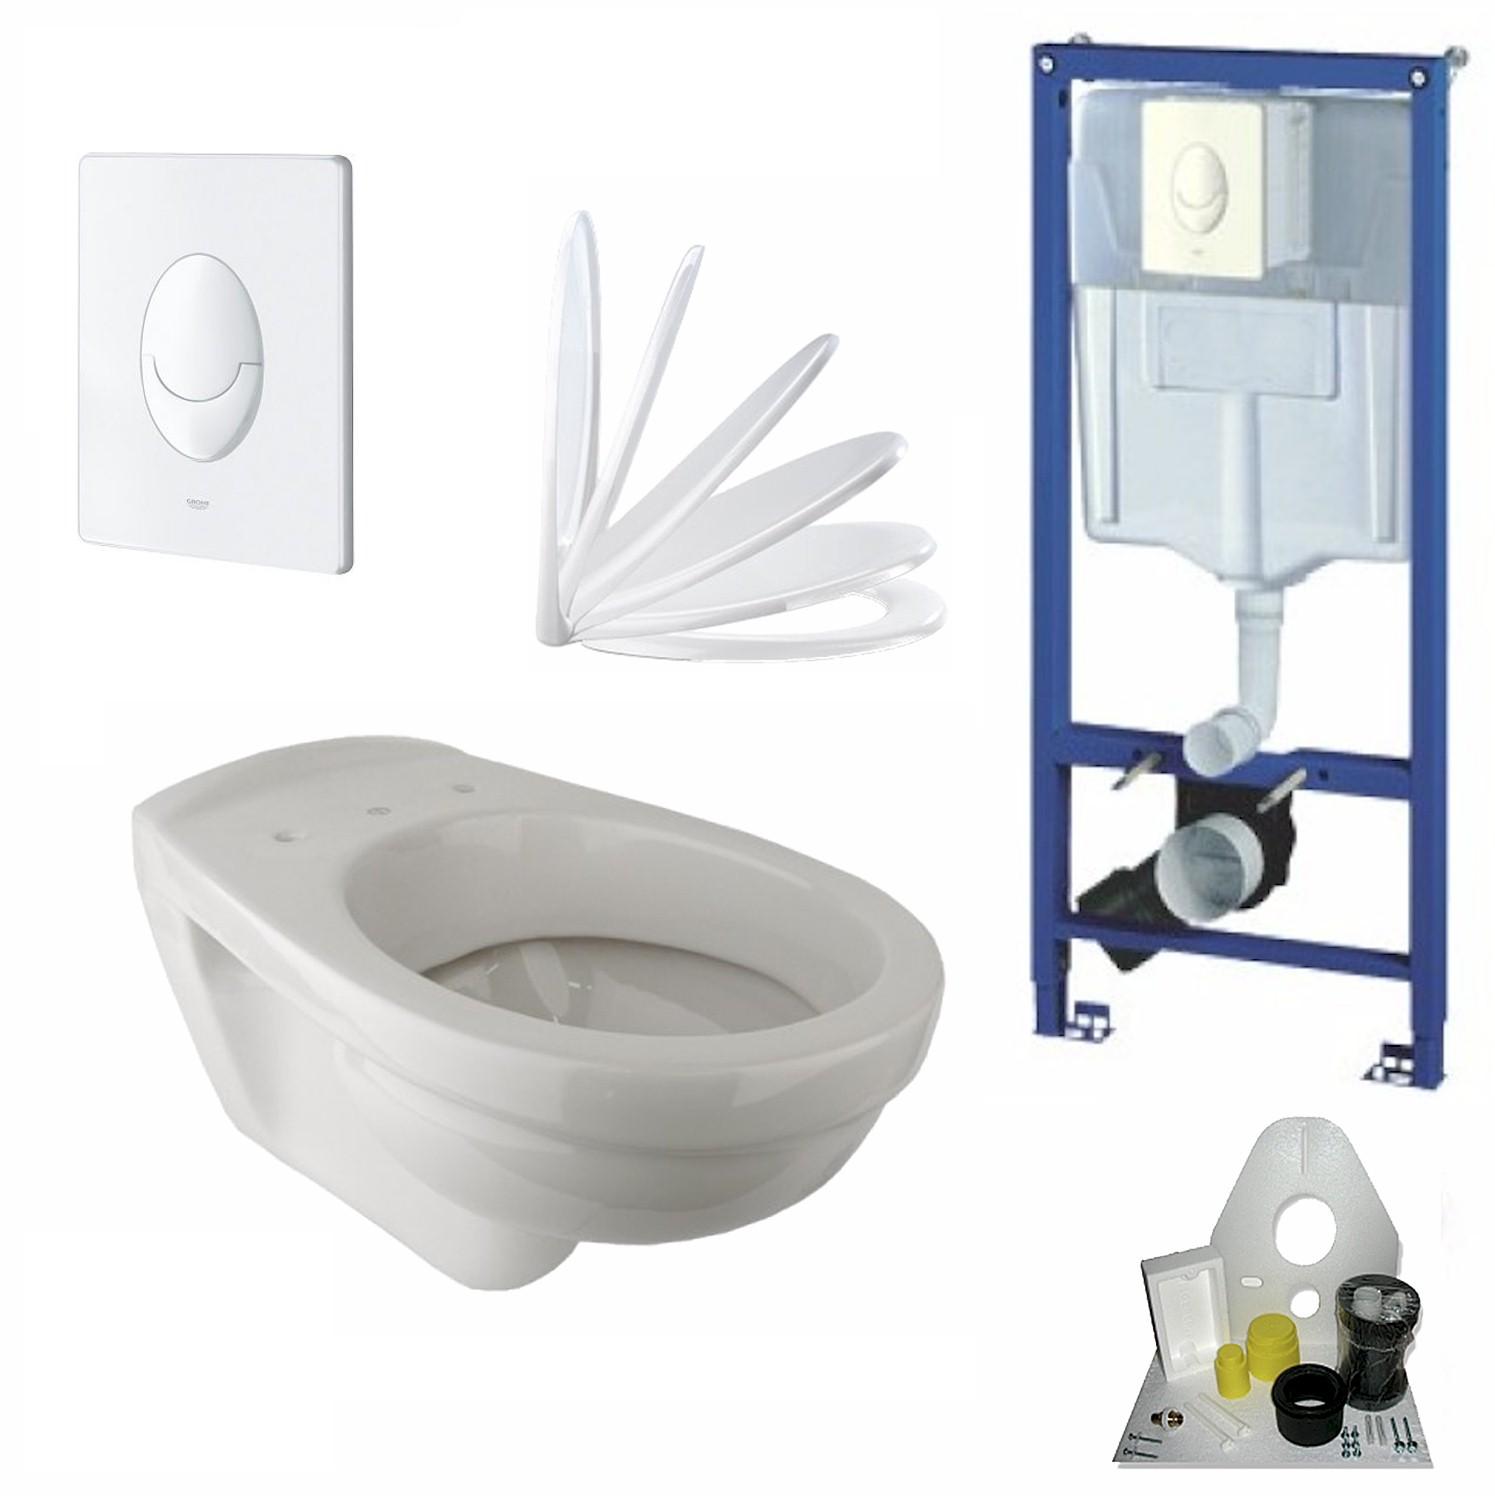 grohe rapid sl sp lkasten design wc dr ckerplatte wei wc sitz beschichtung. Black Bedroom Furniture Sets. Home Design Ideas